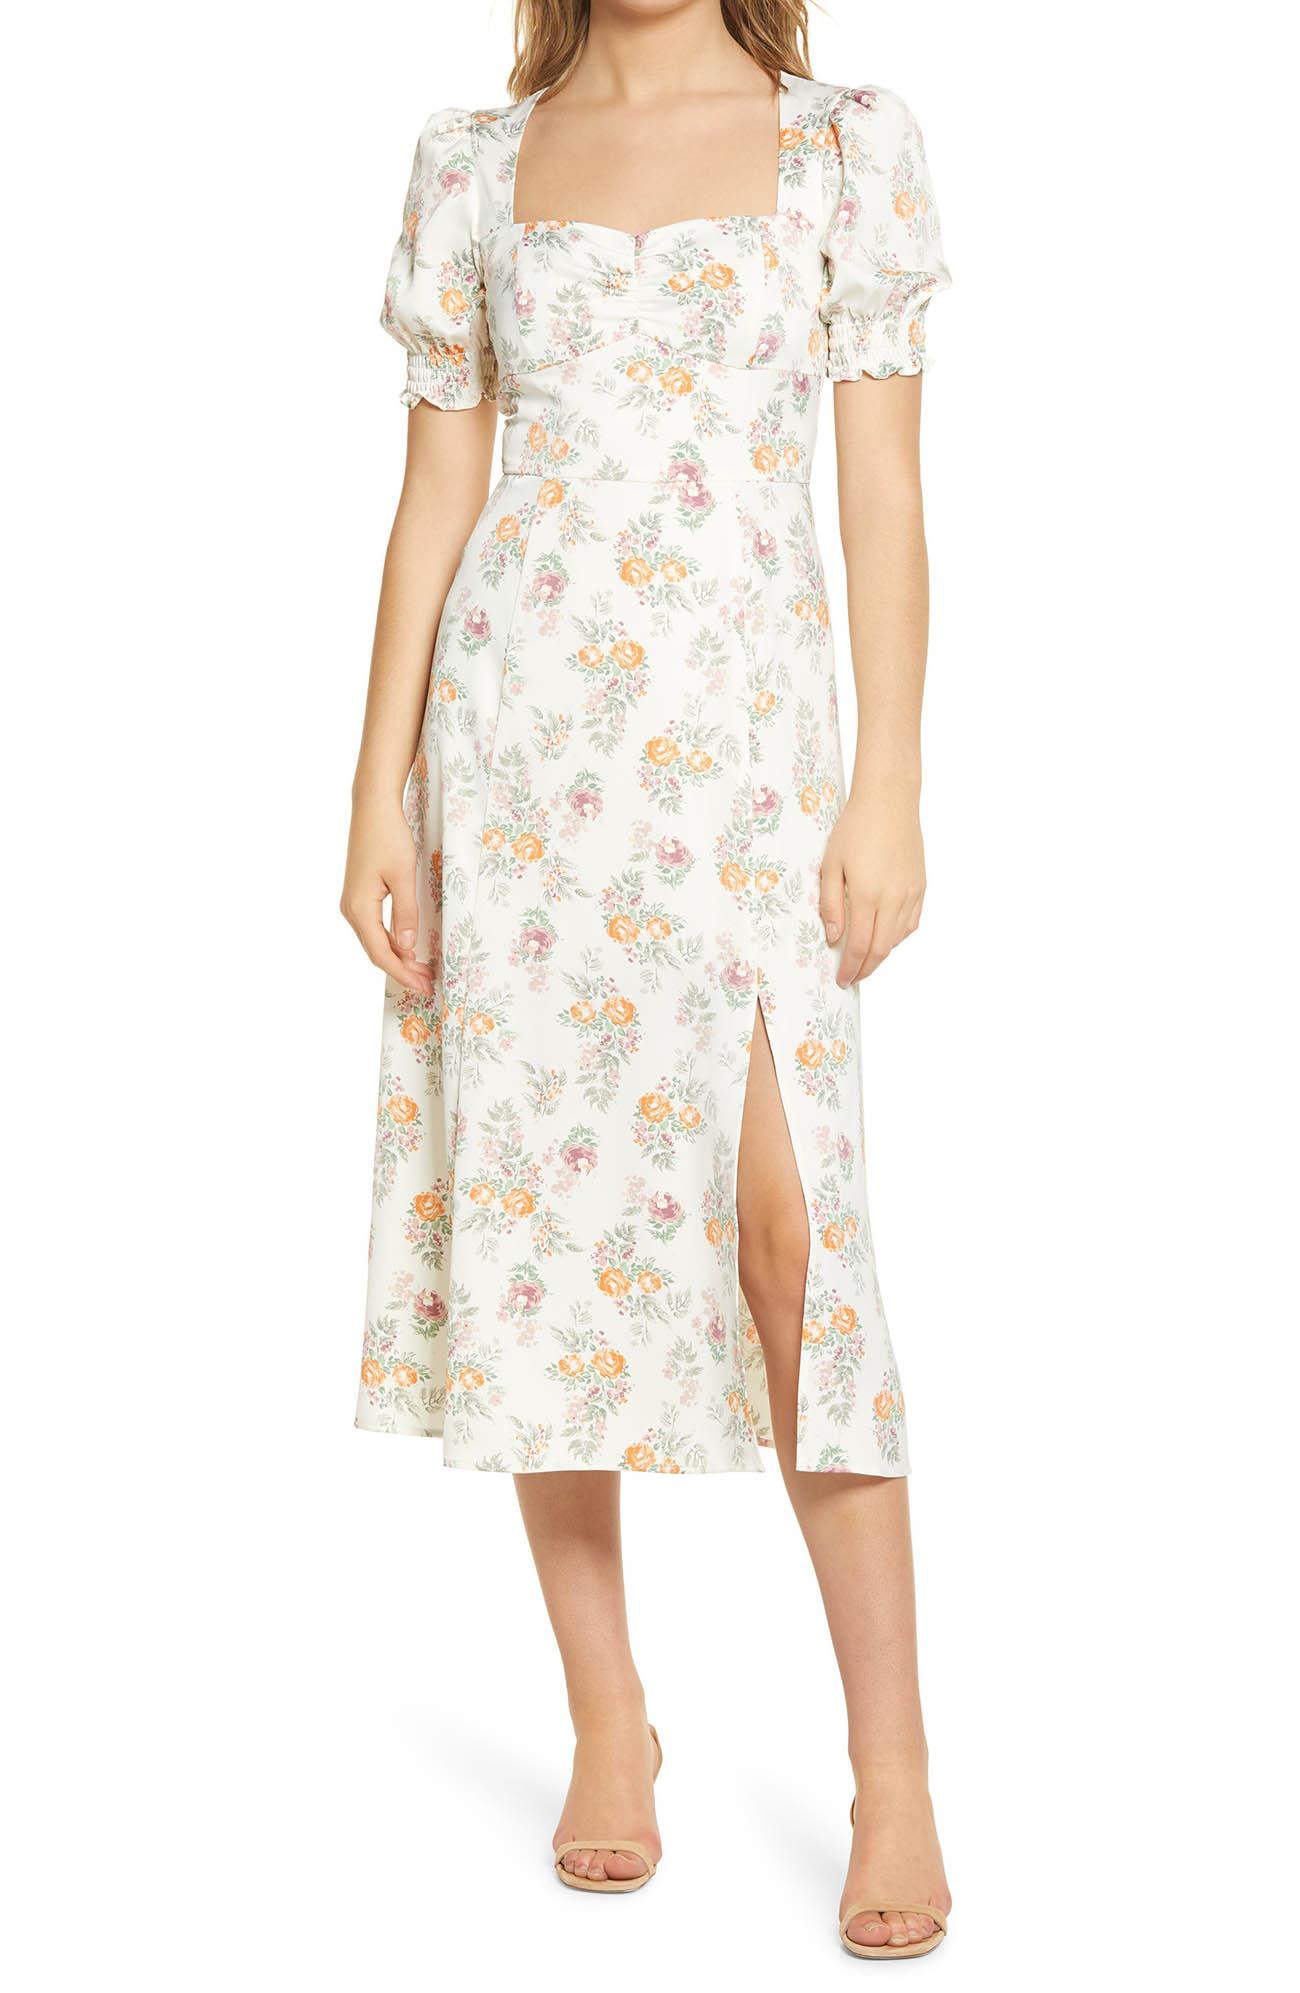 Beatrix Bustier Midi Dress for a spring wedding